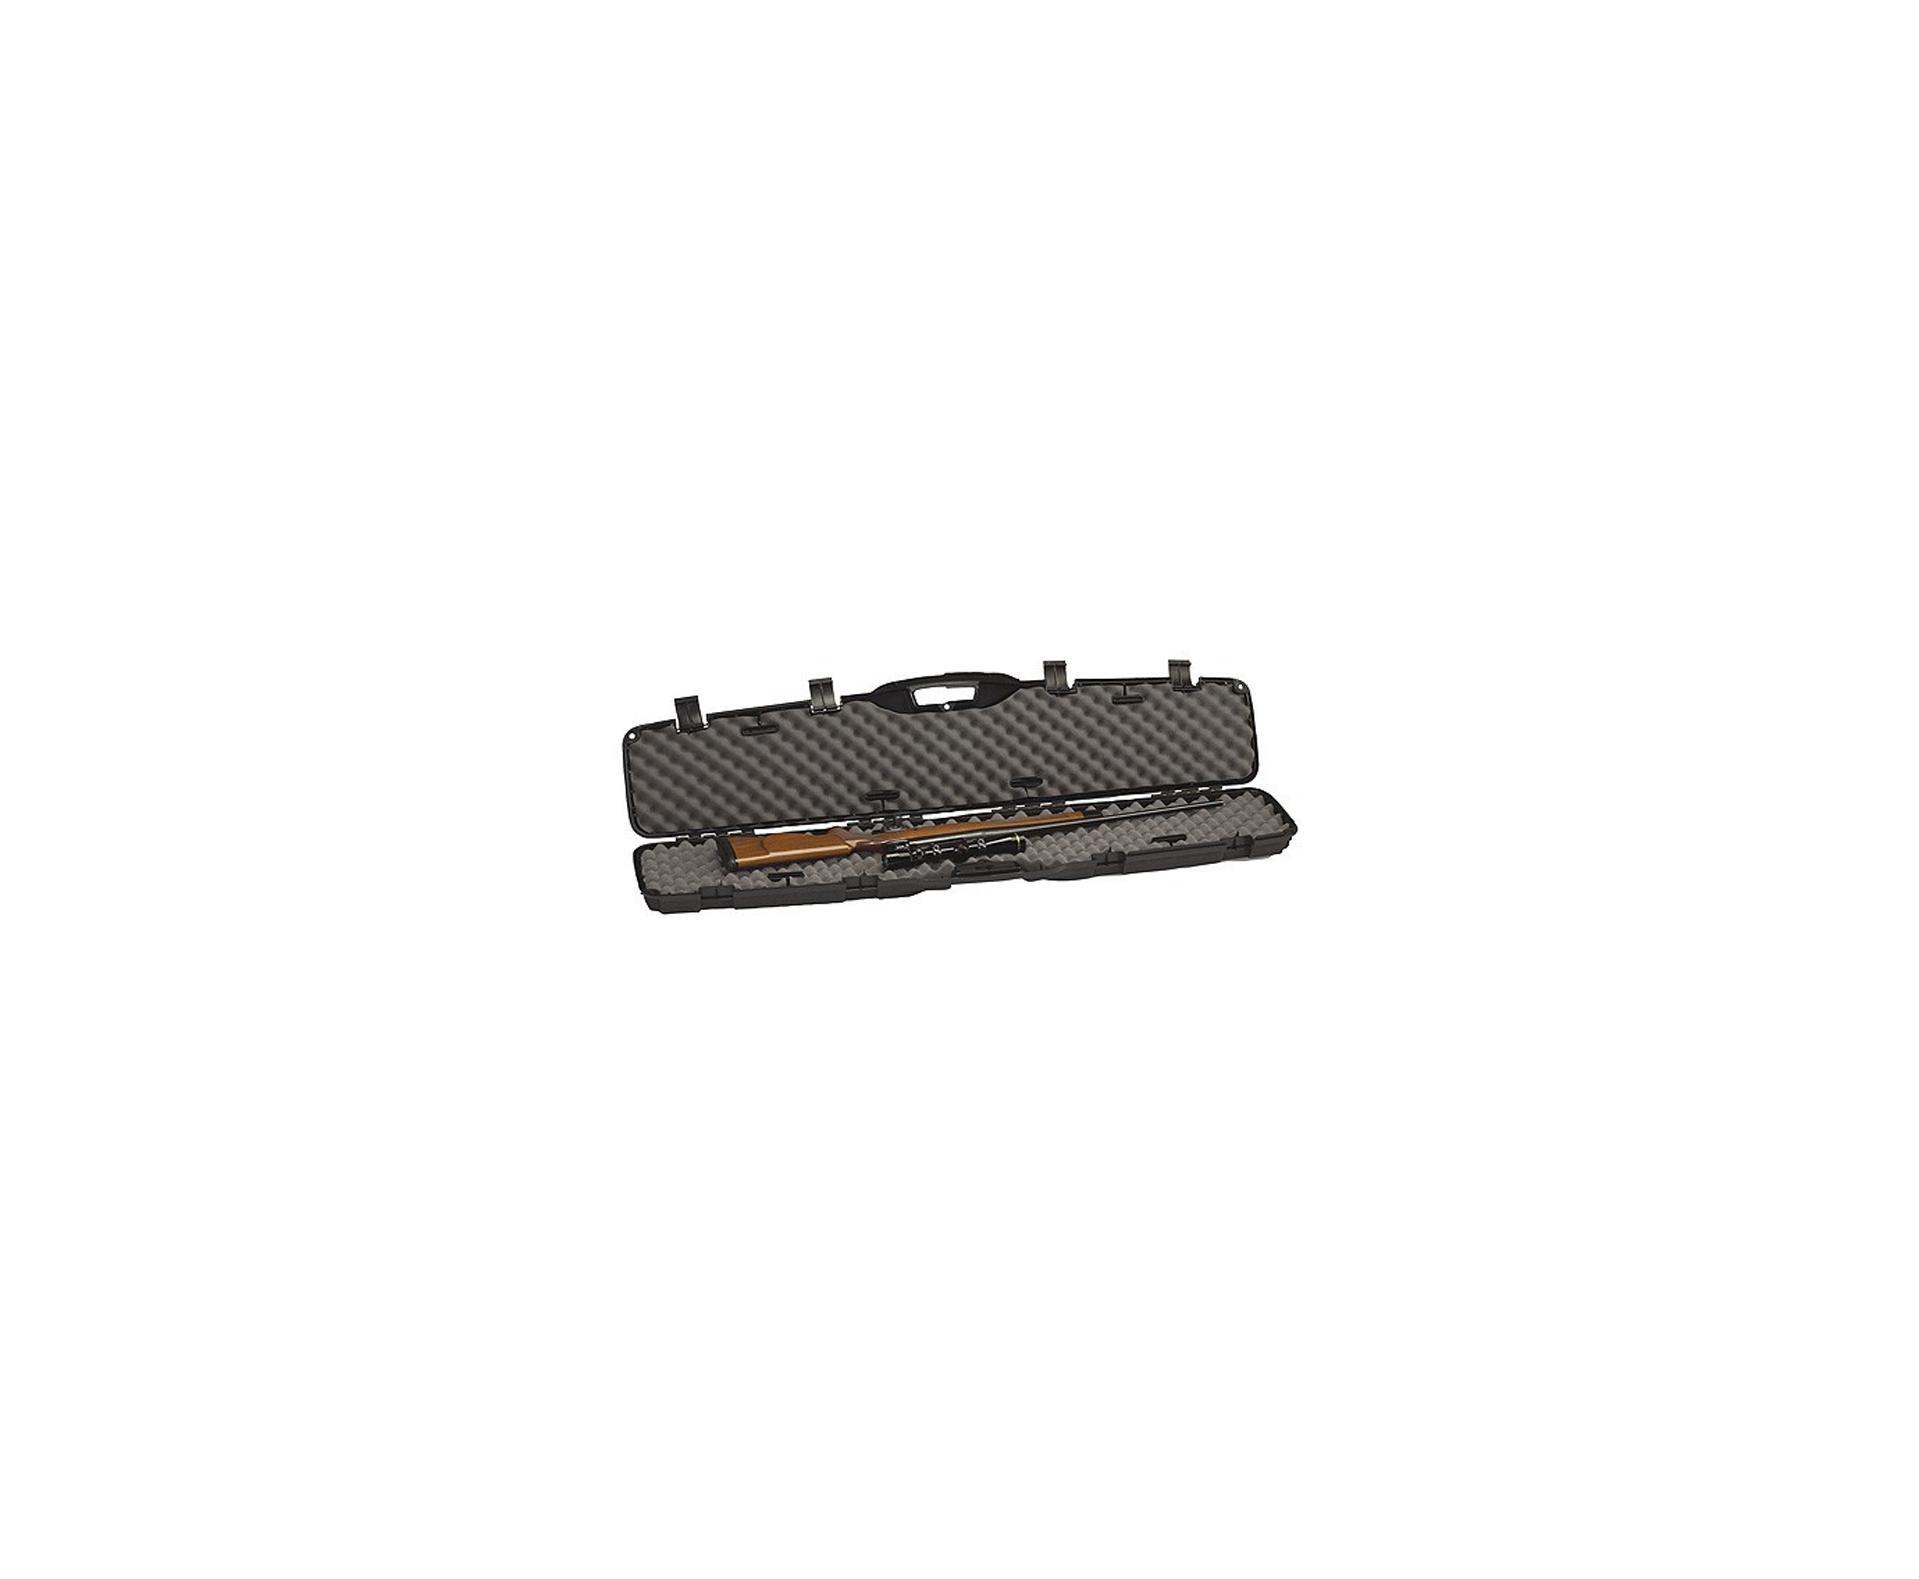 Caixa (case) Para Arma - Pro Max 1531-01 - Plano